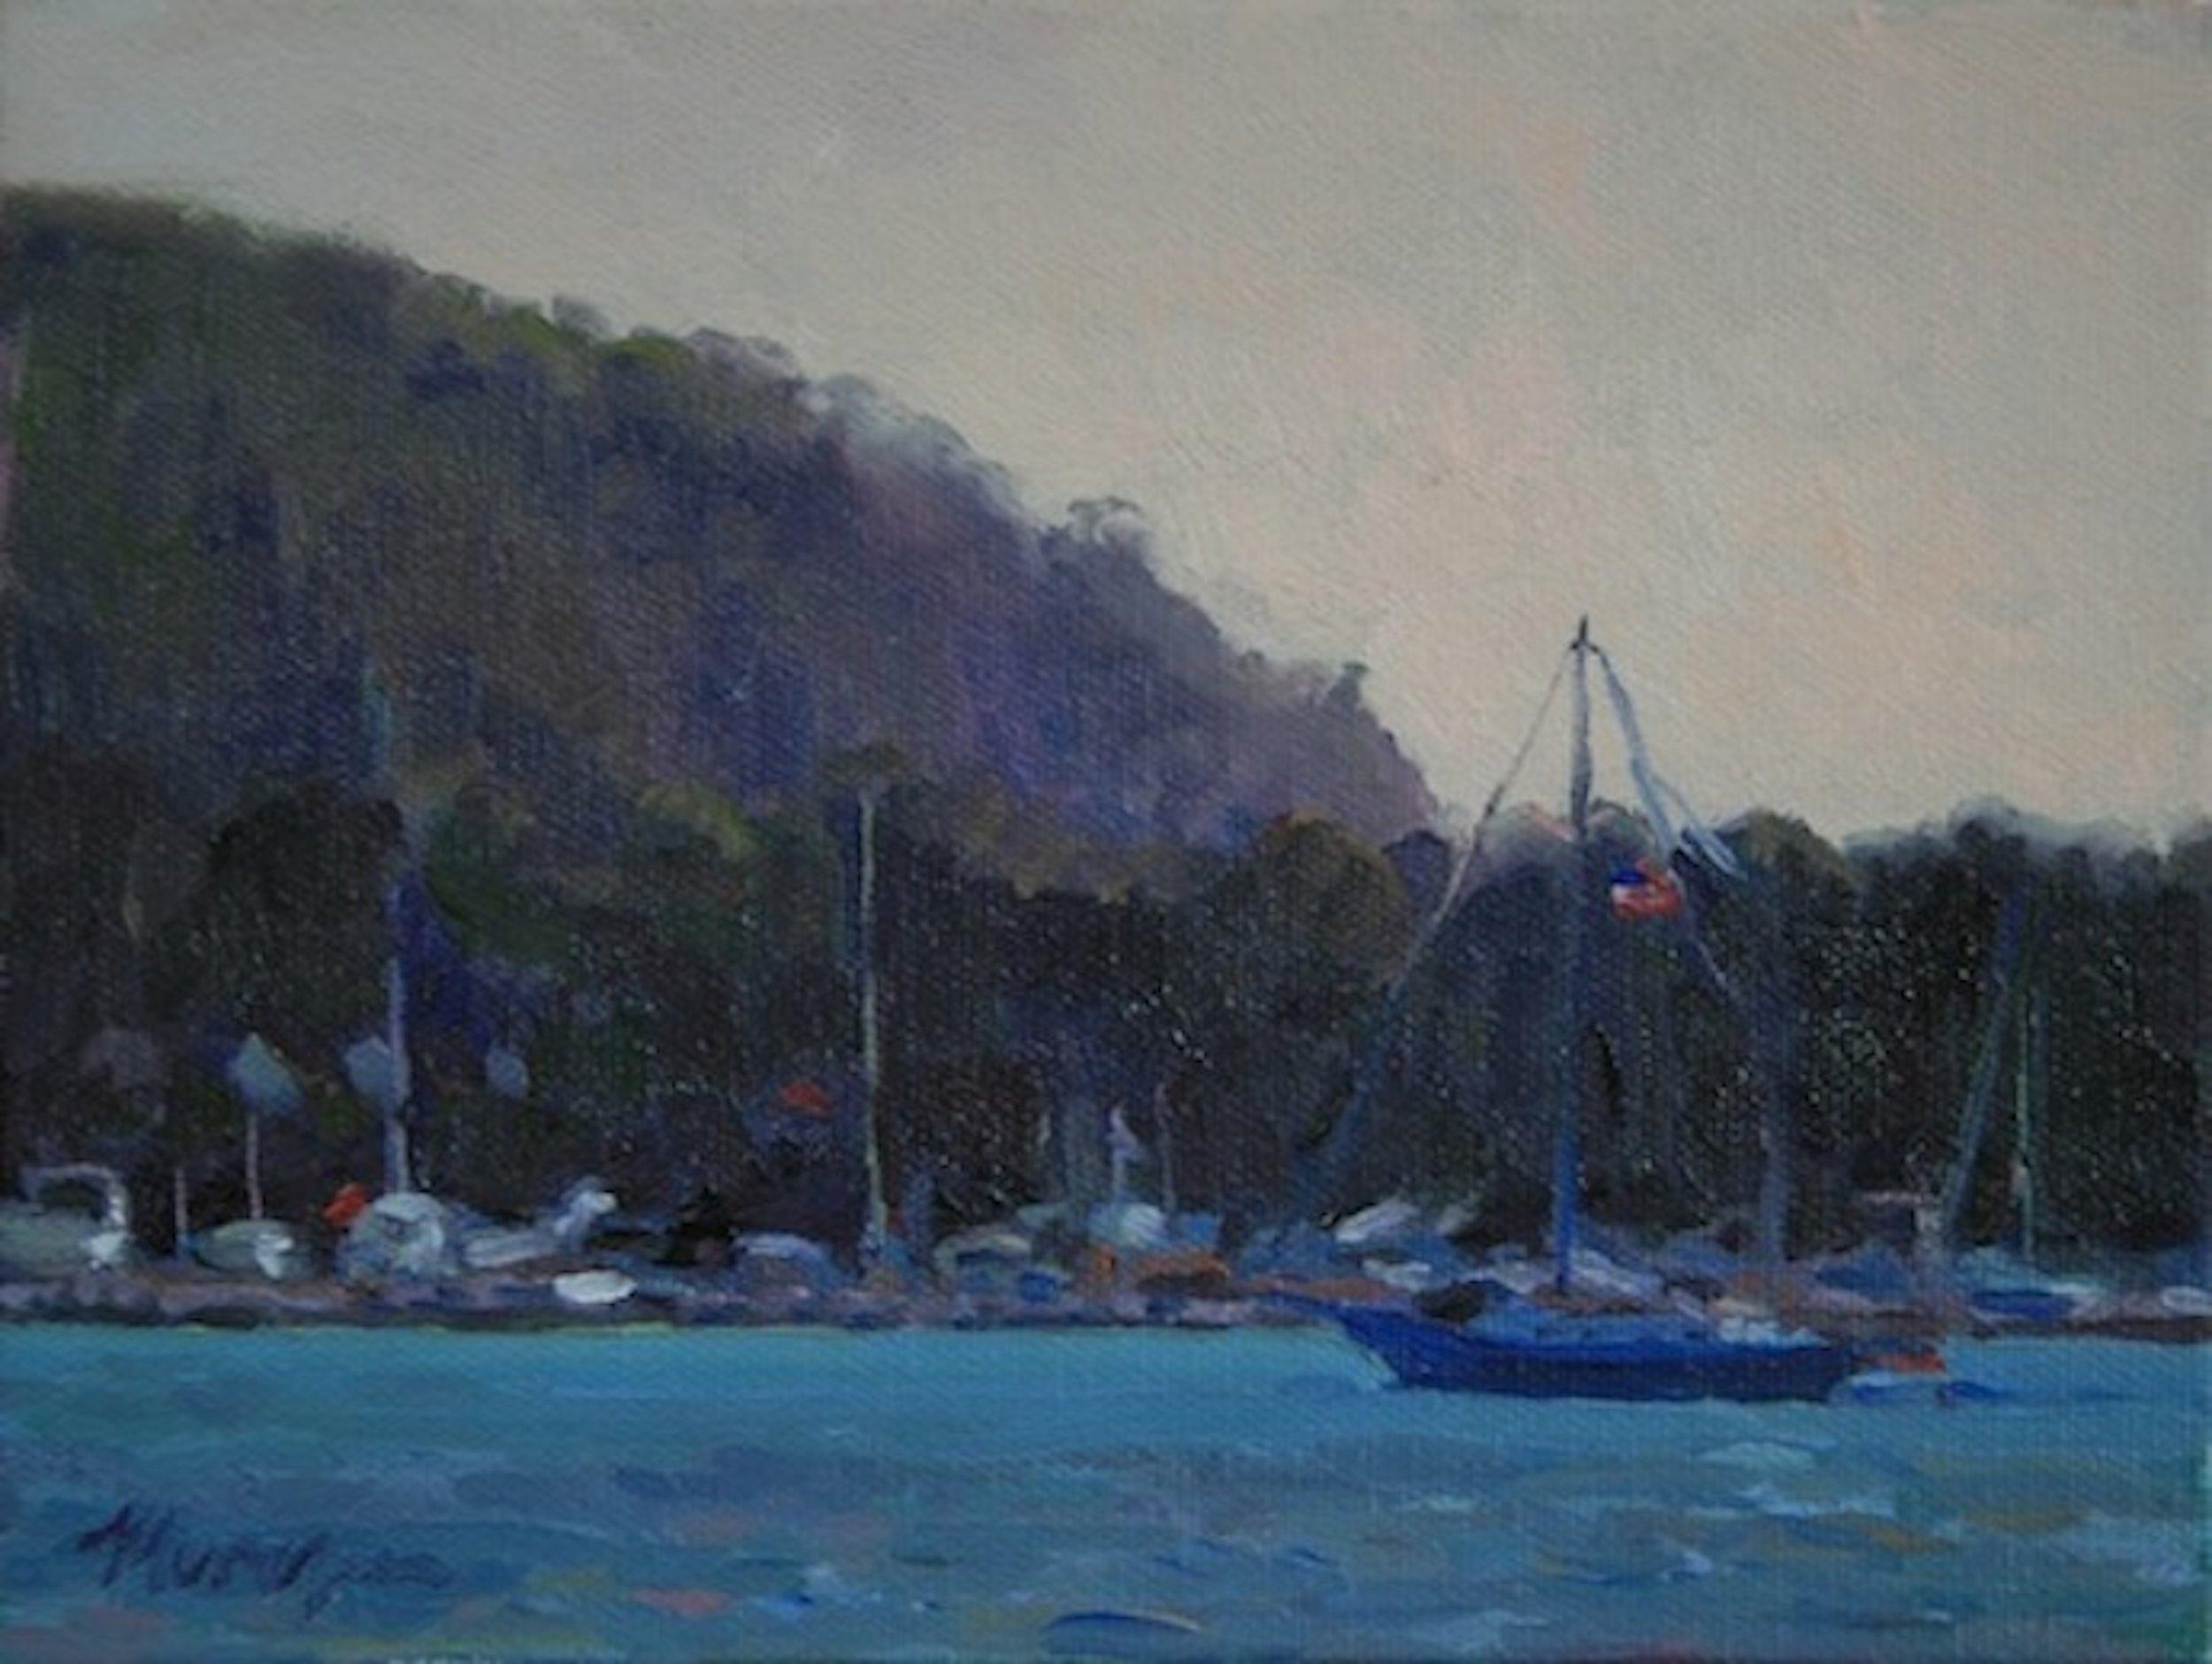 Blue Boat-oil-8x10-c2012-$350.00.jpg